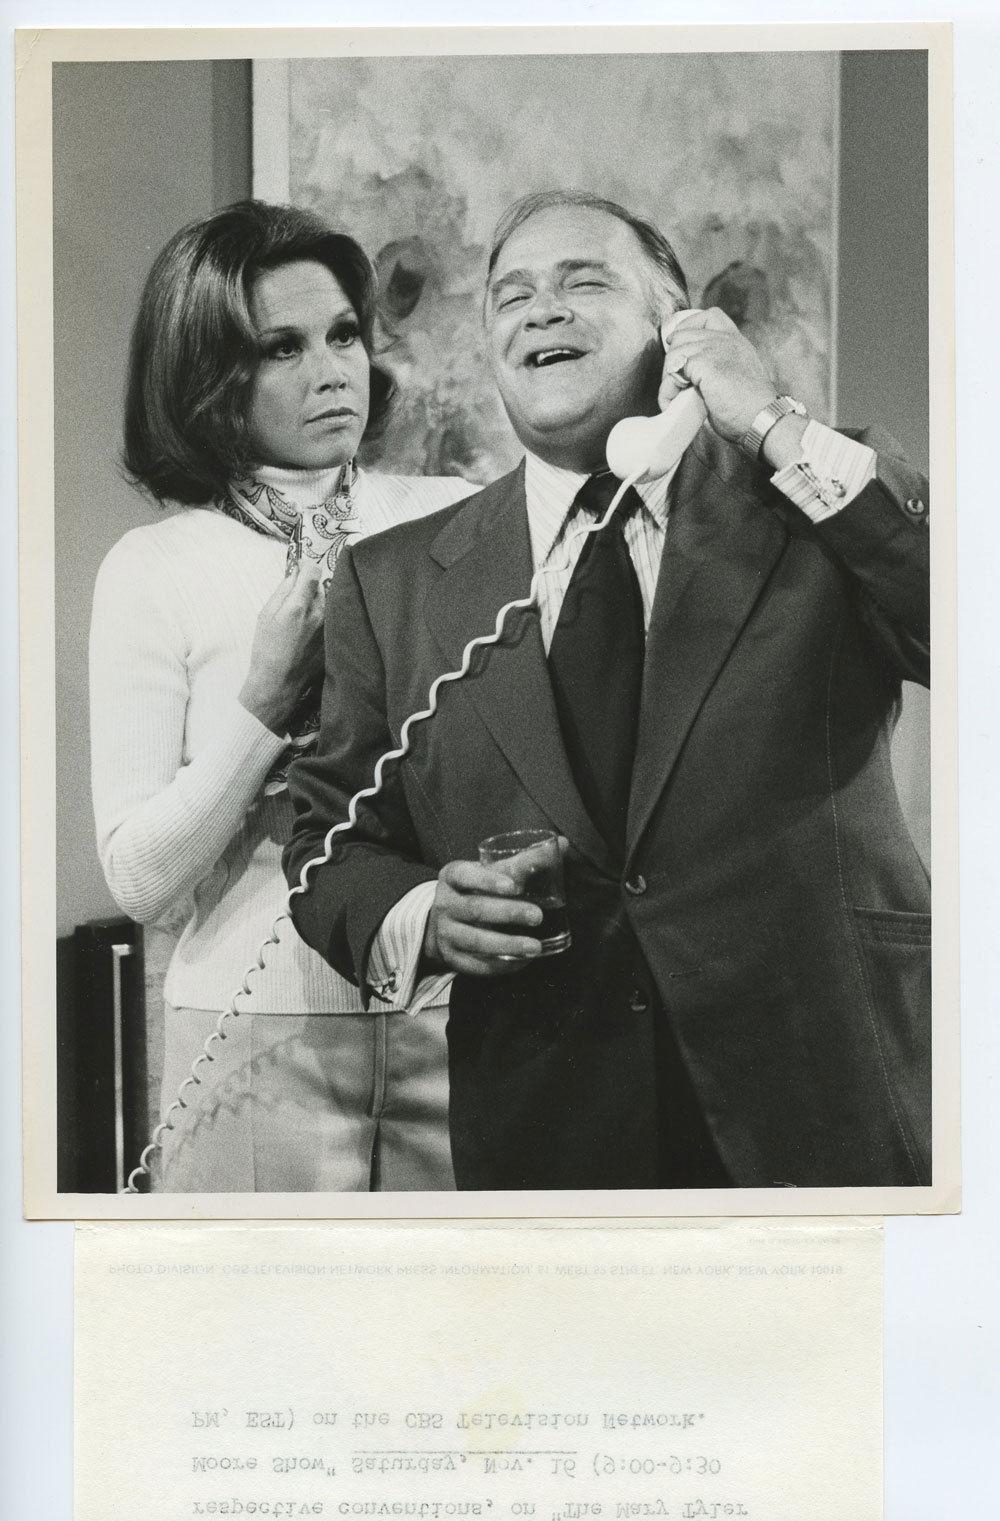 Mary Tyler Moor Photo 1974 Oct 18 CBS TV Show Promo